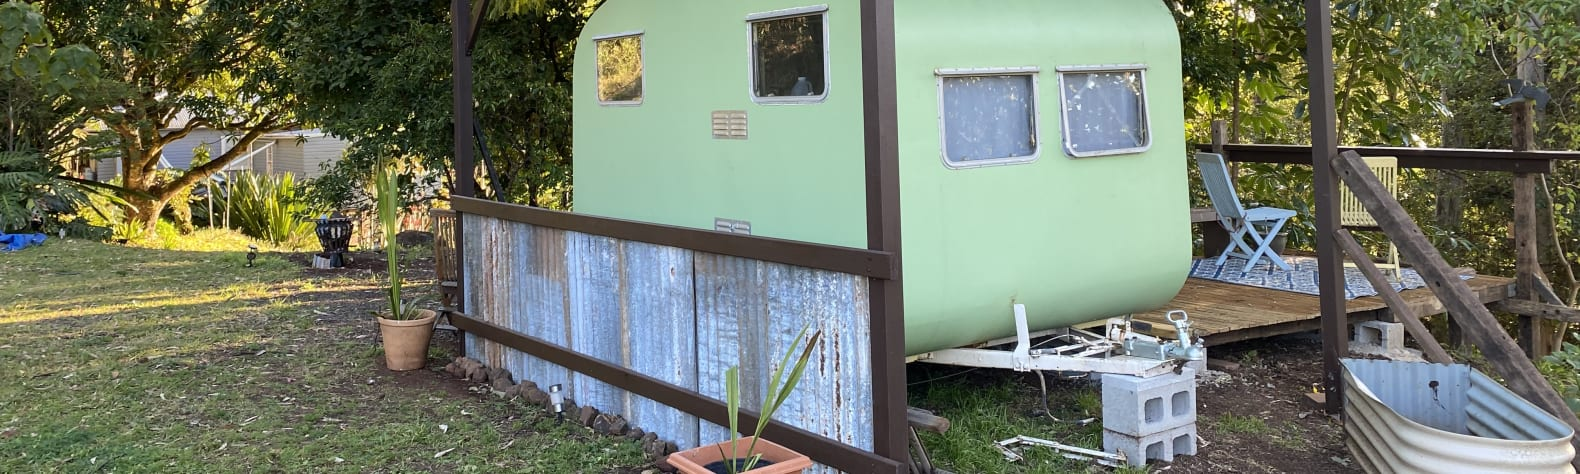 Retro Caravan in the Rainforest